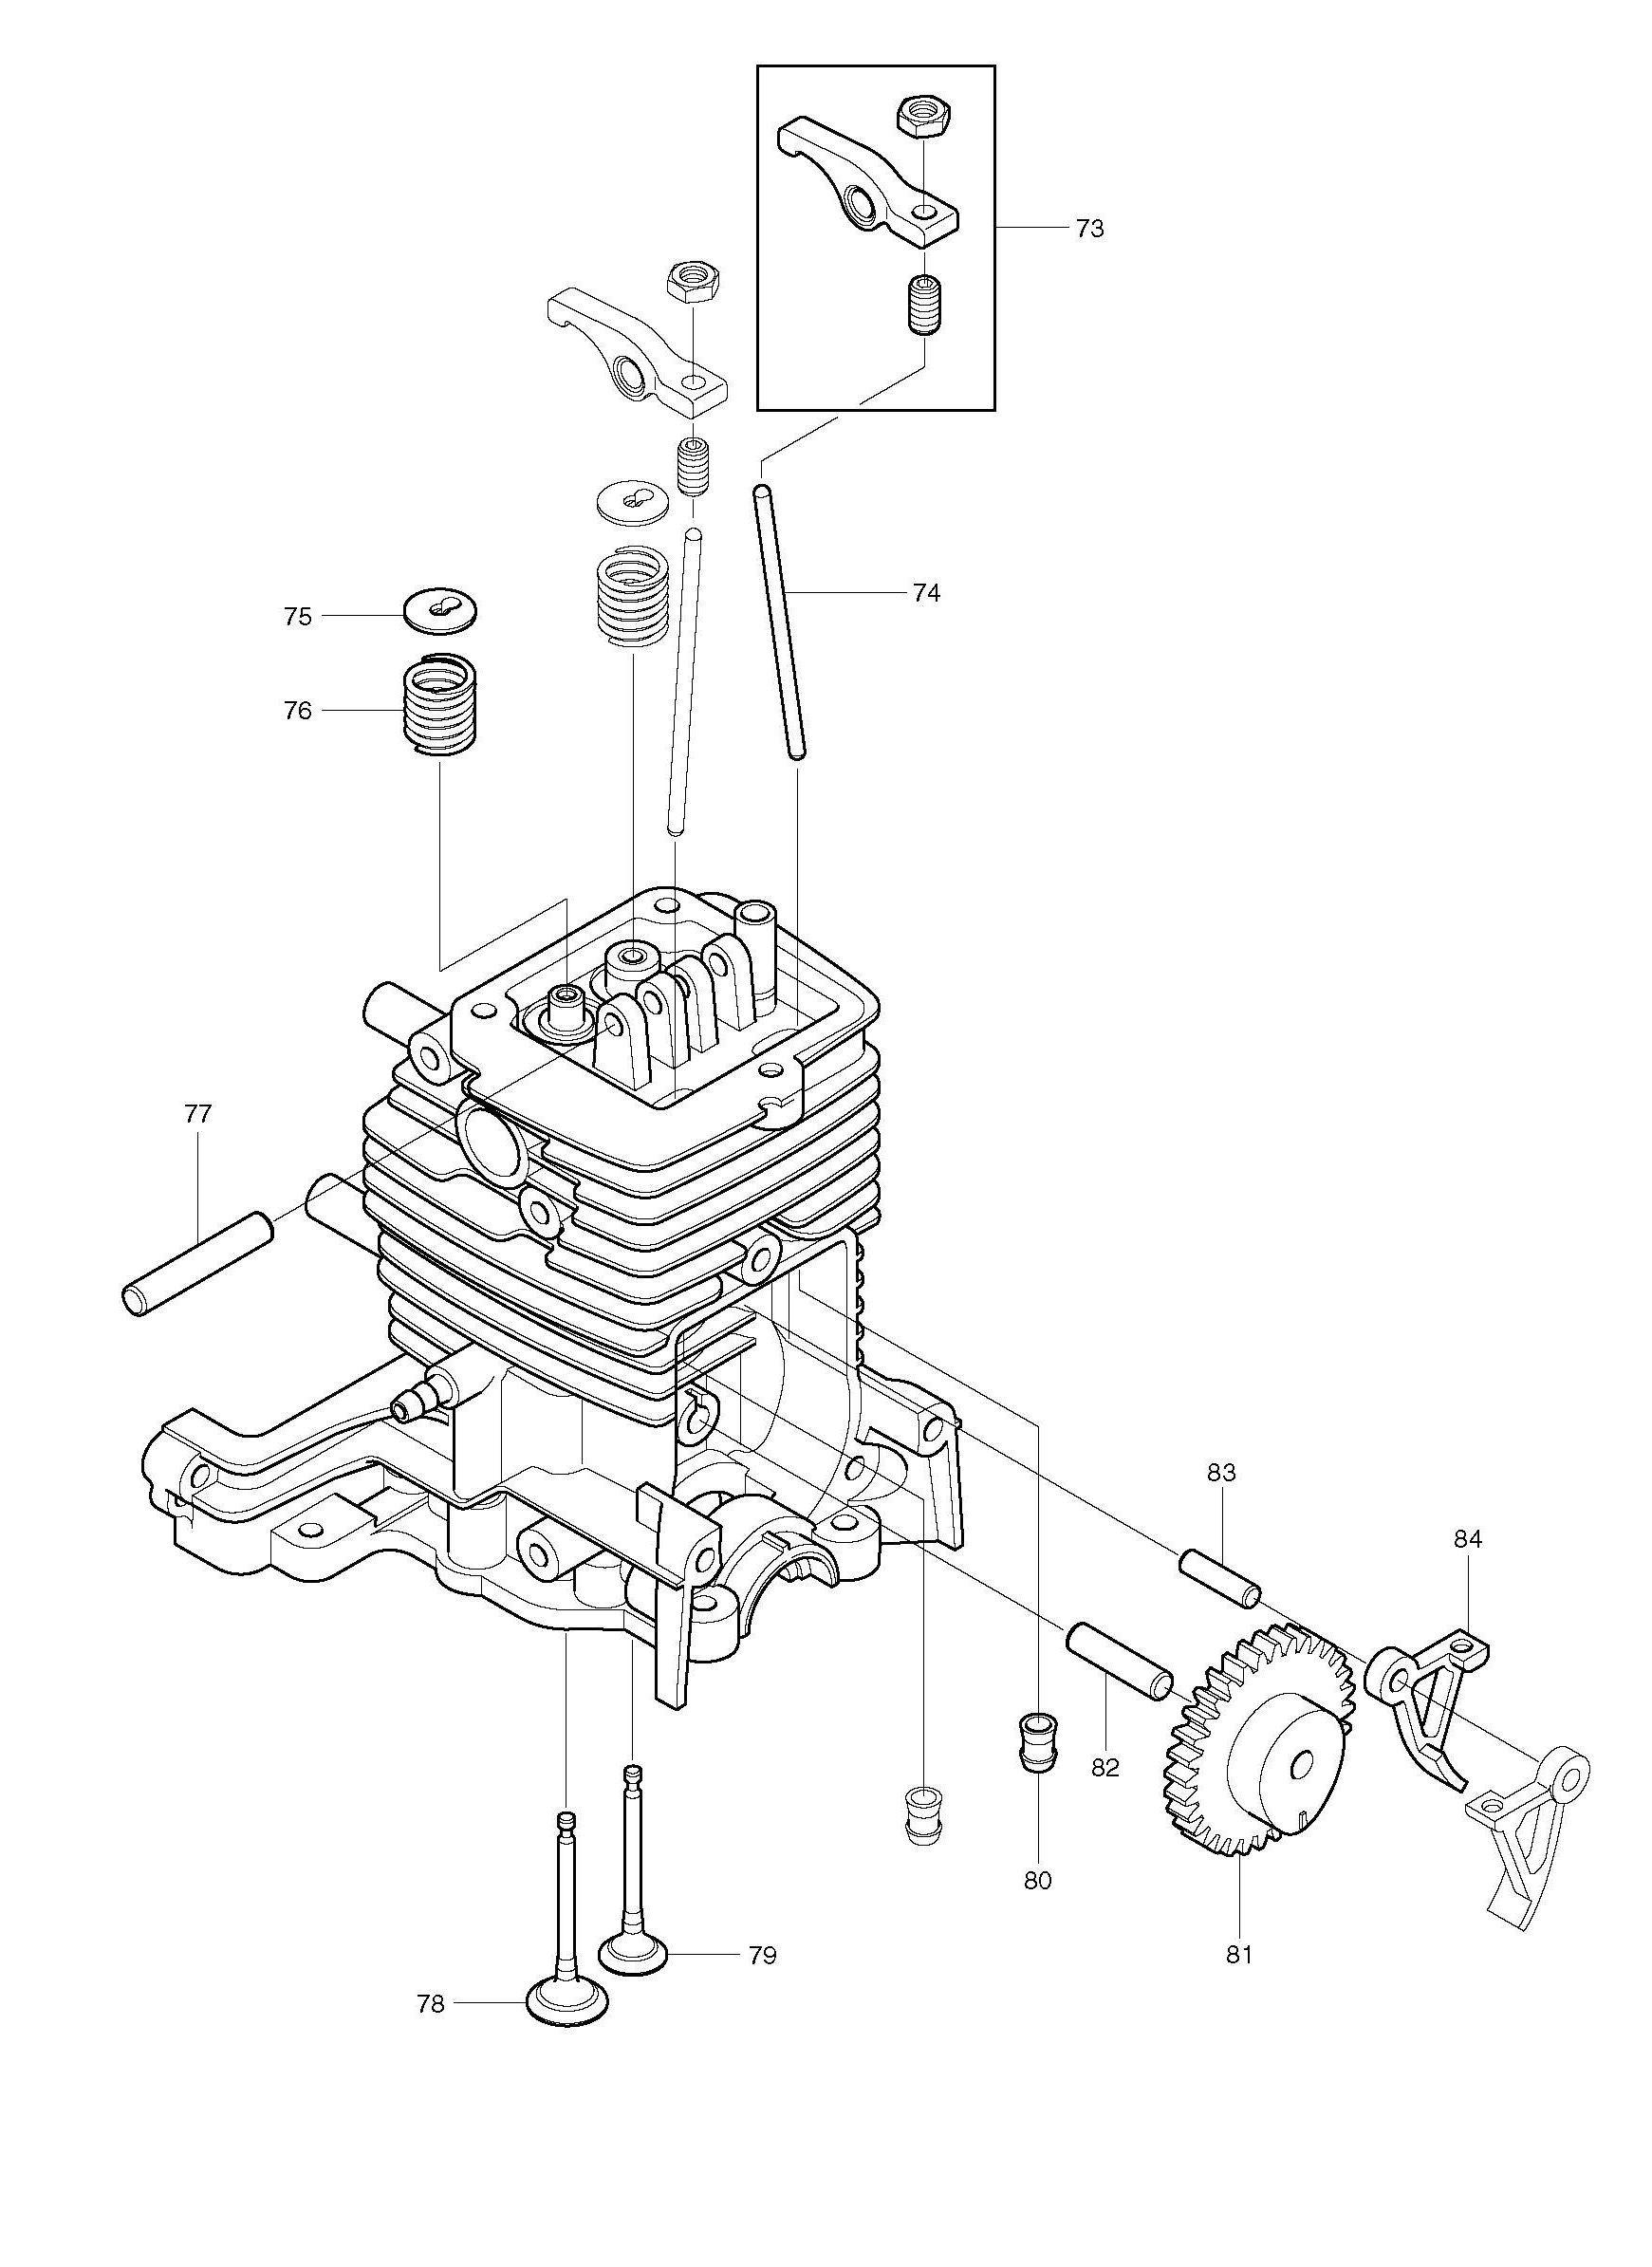 4 Stroke Petrol Engine Diagram